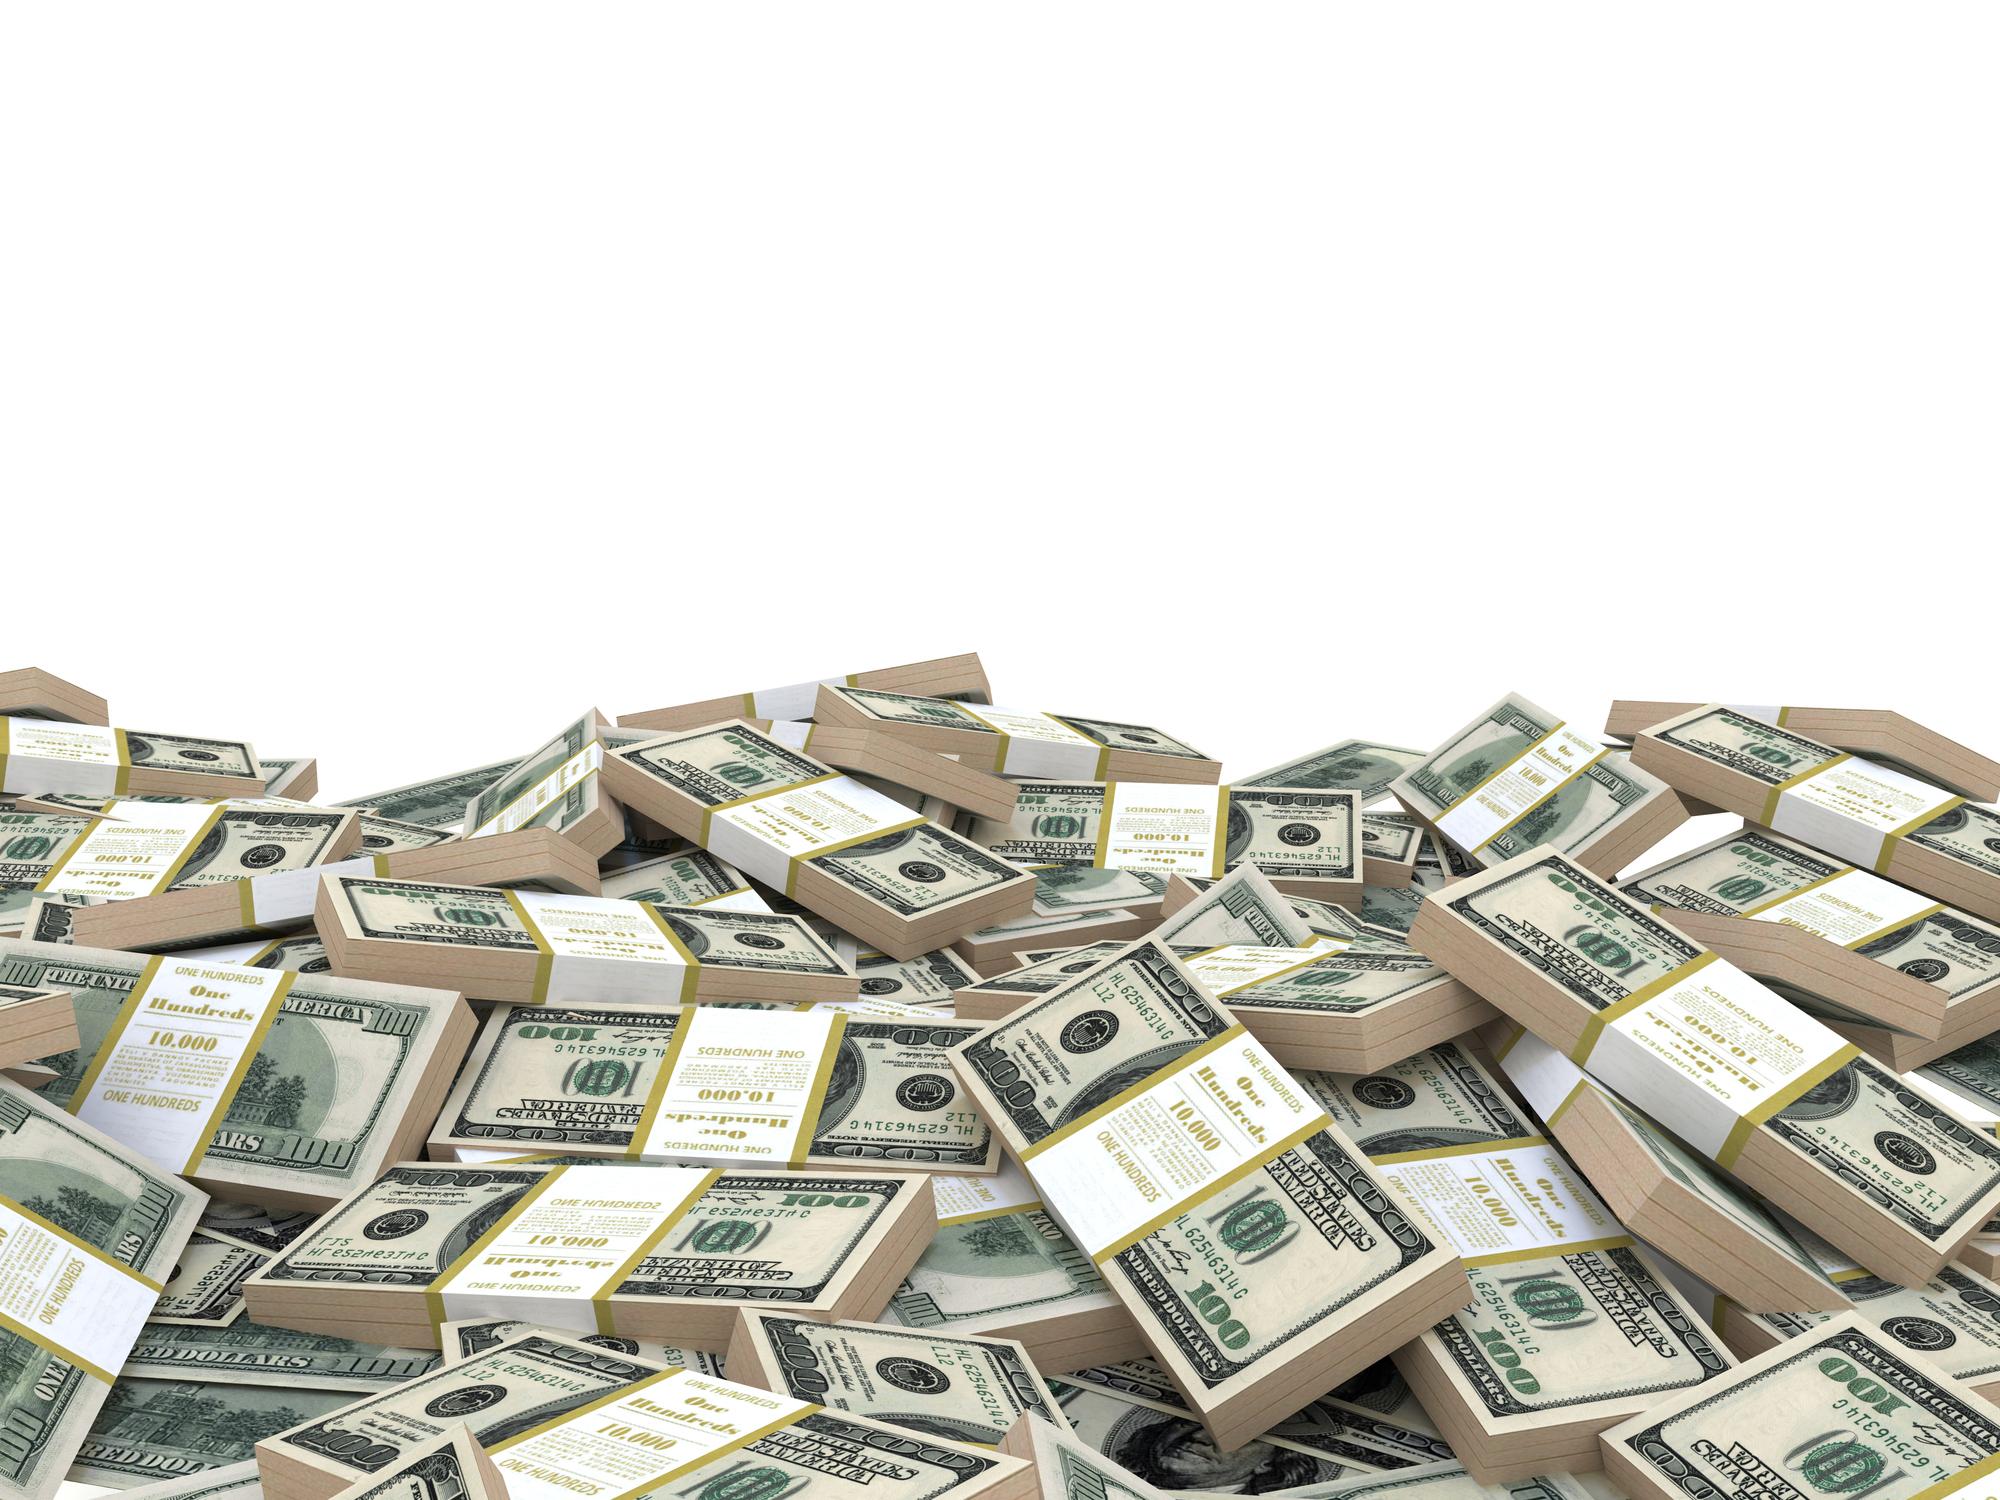 Stacks of $100 dollar bills.